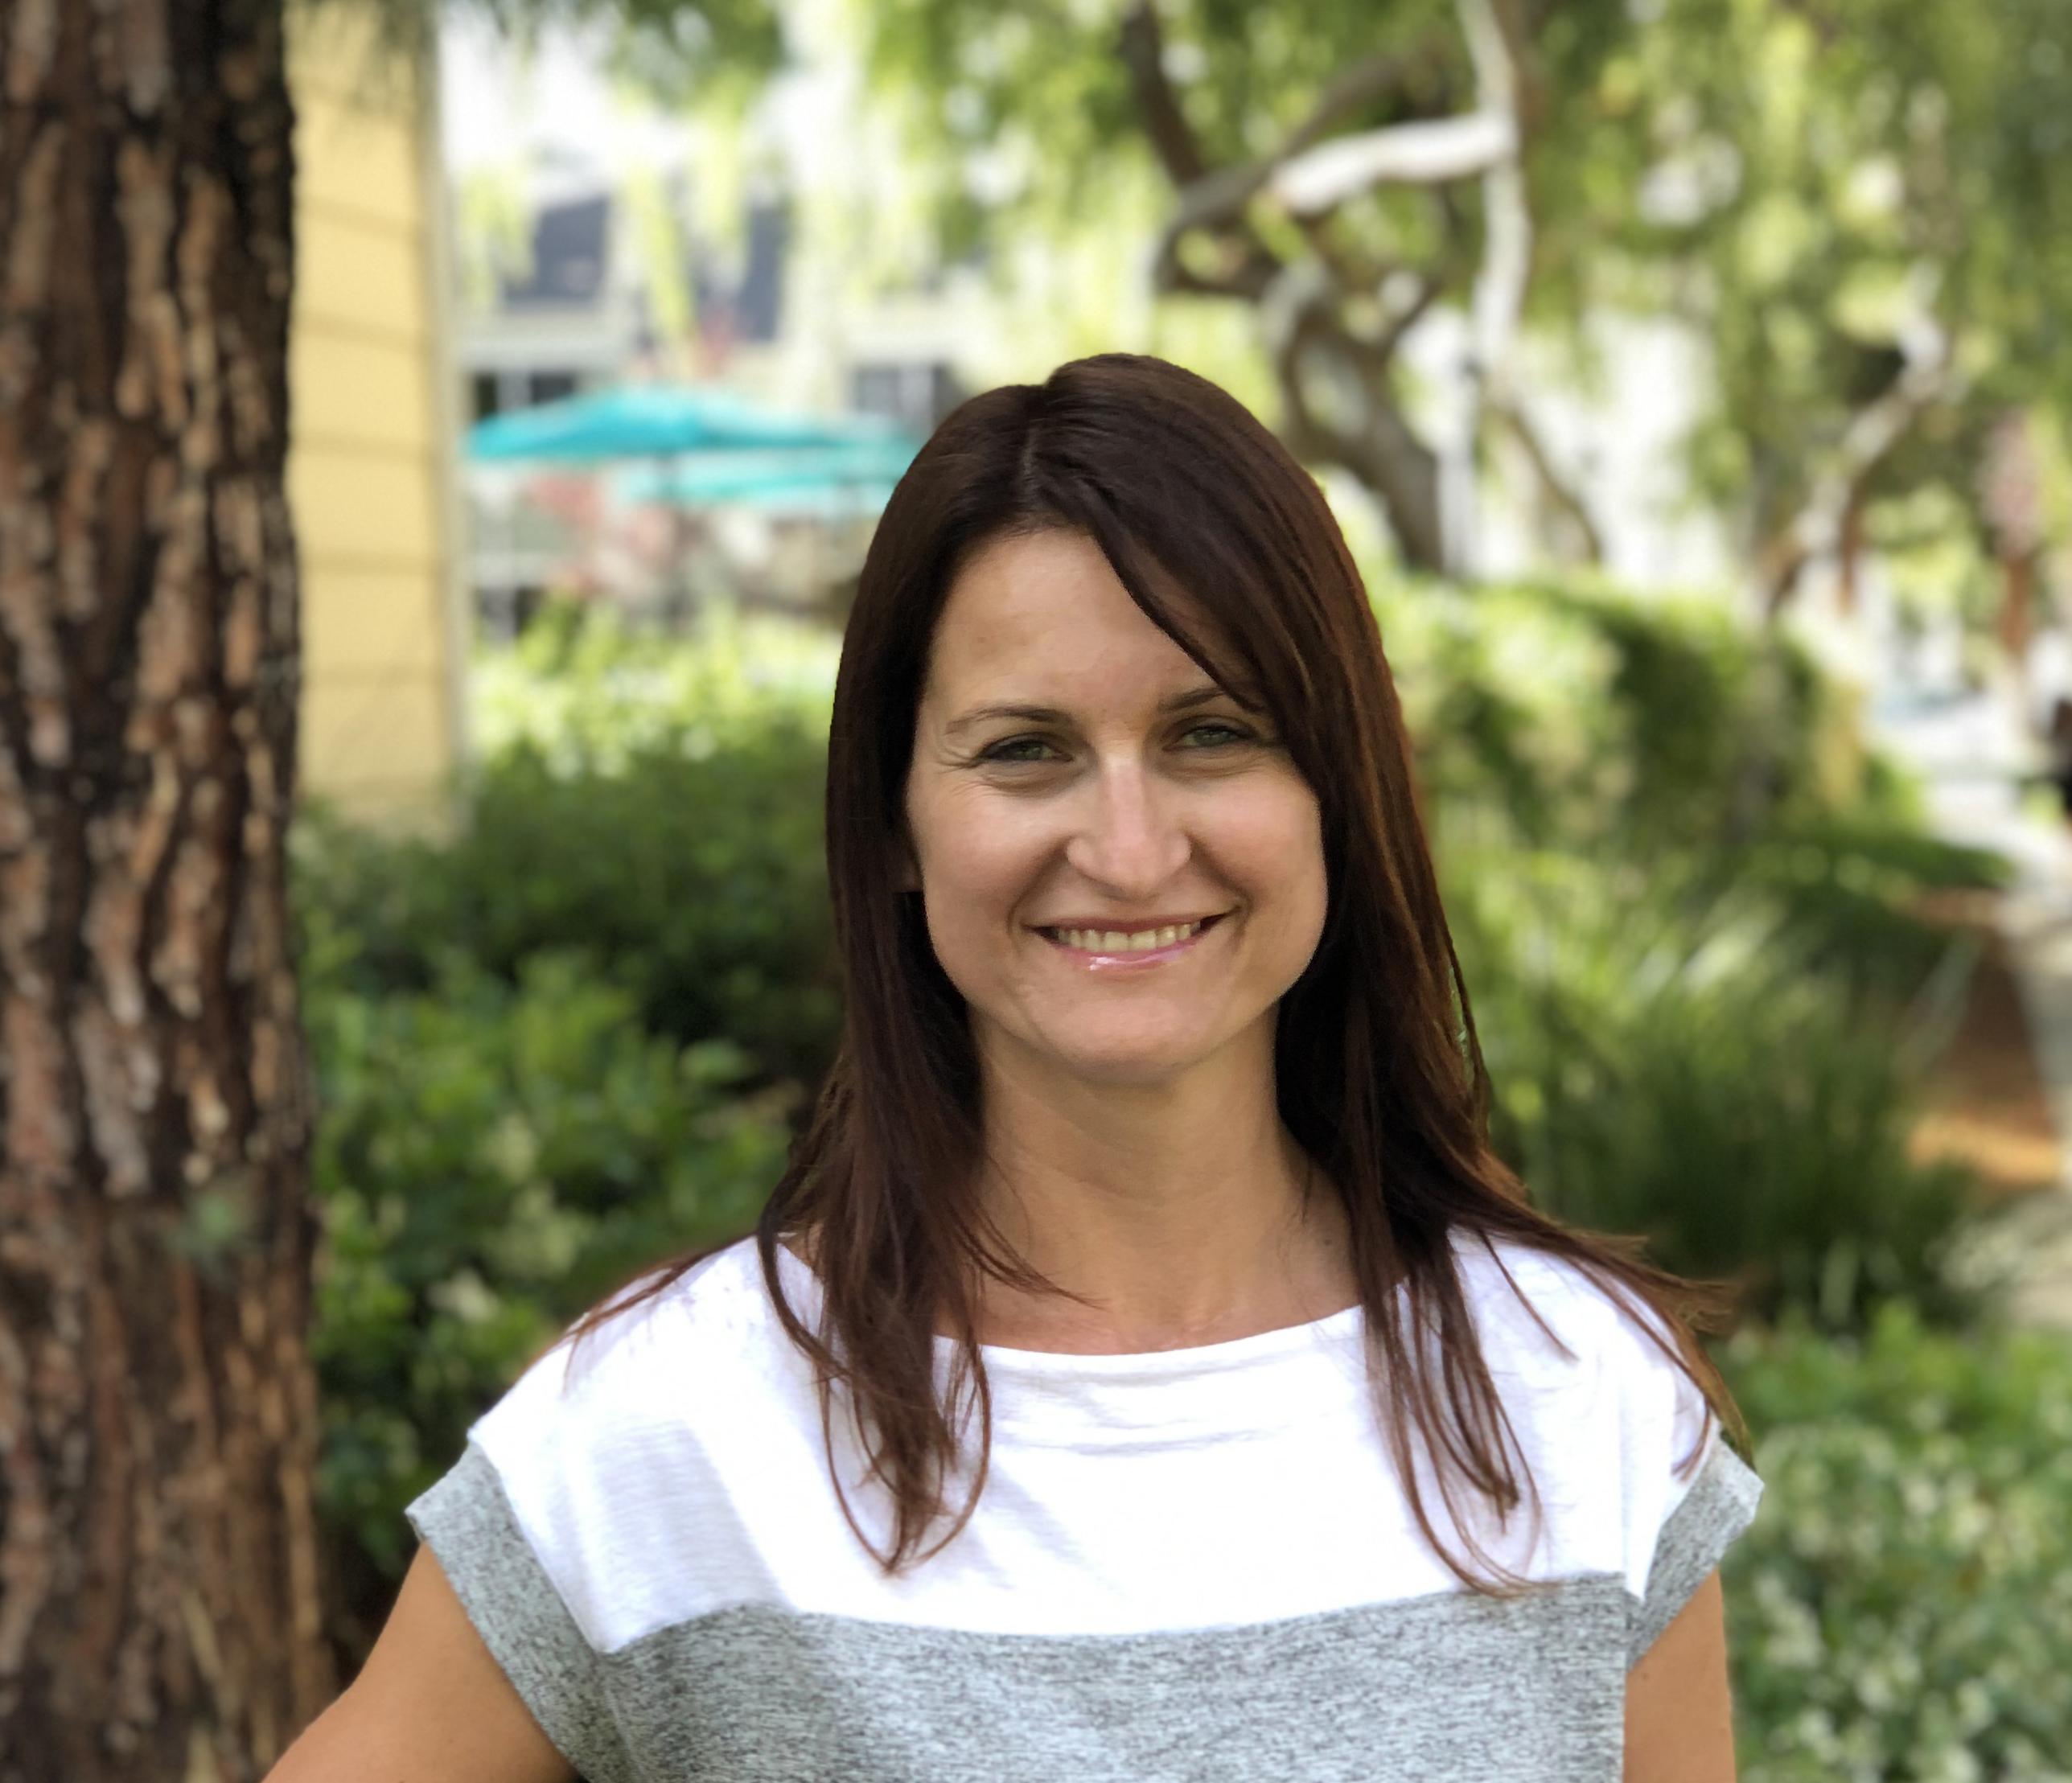 Urszula Semerda, OT in California, Founder of Sensory Lifestyle